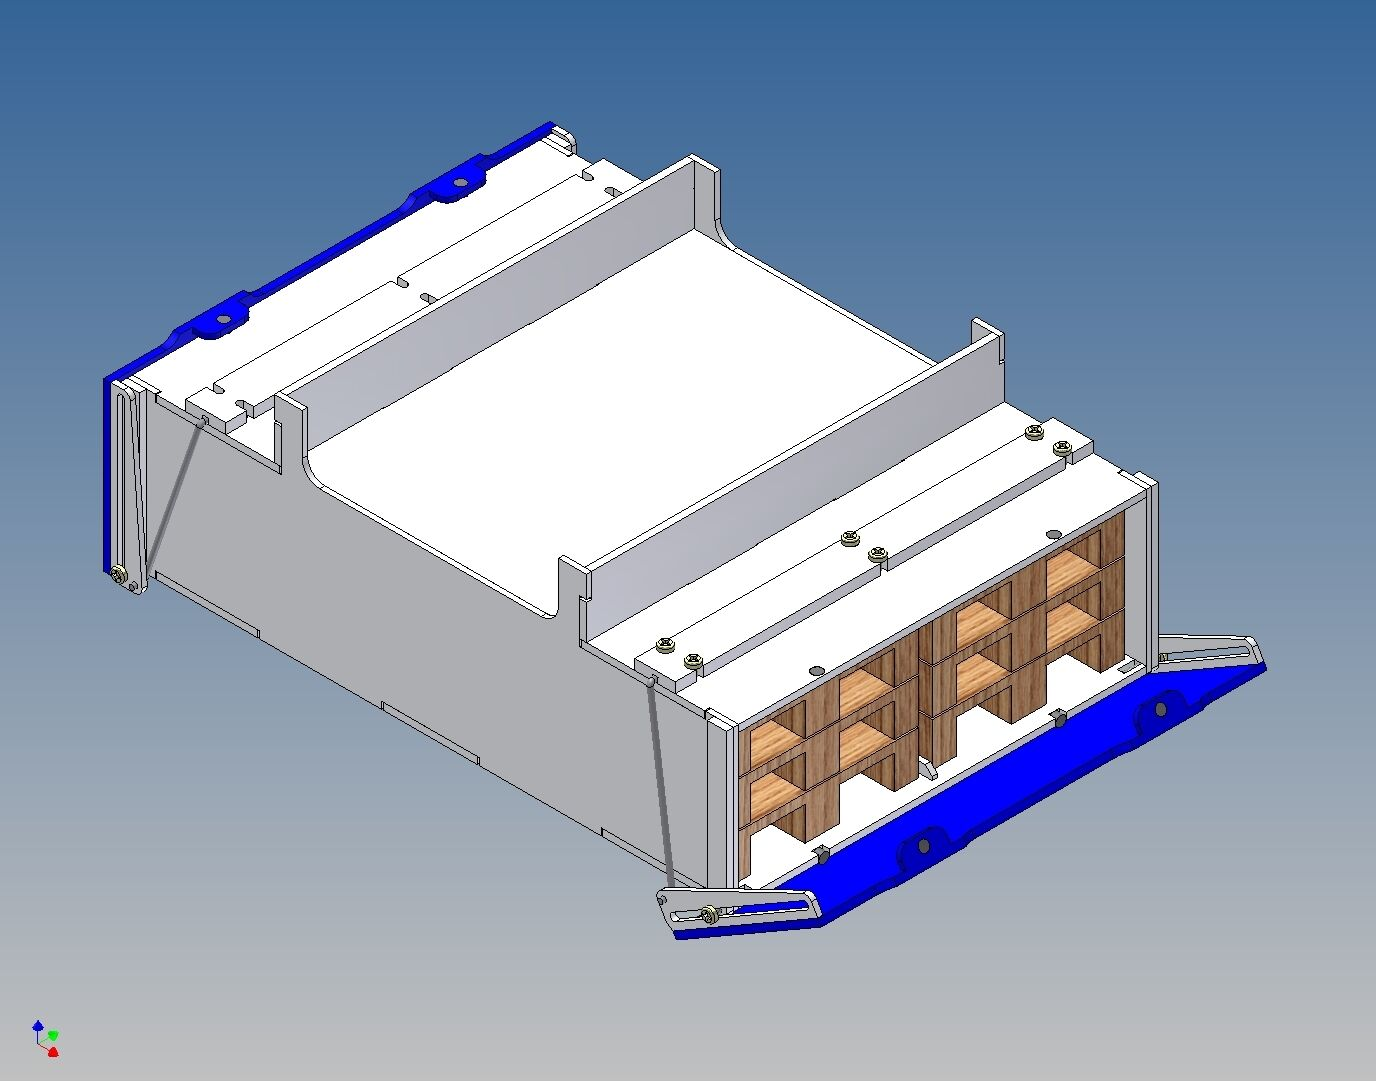 PB130V Palettenstaubox (voll) für Carson Trailer - 130 120 l x 46 h x 180 b